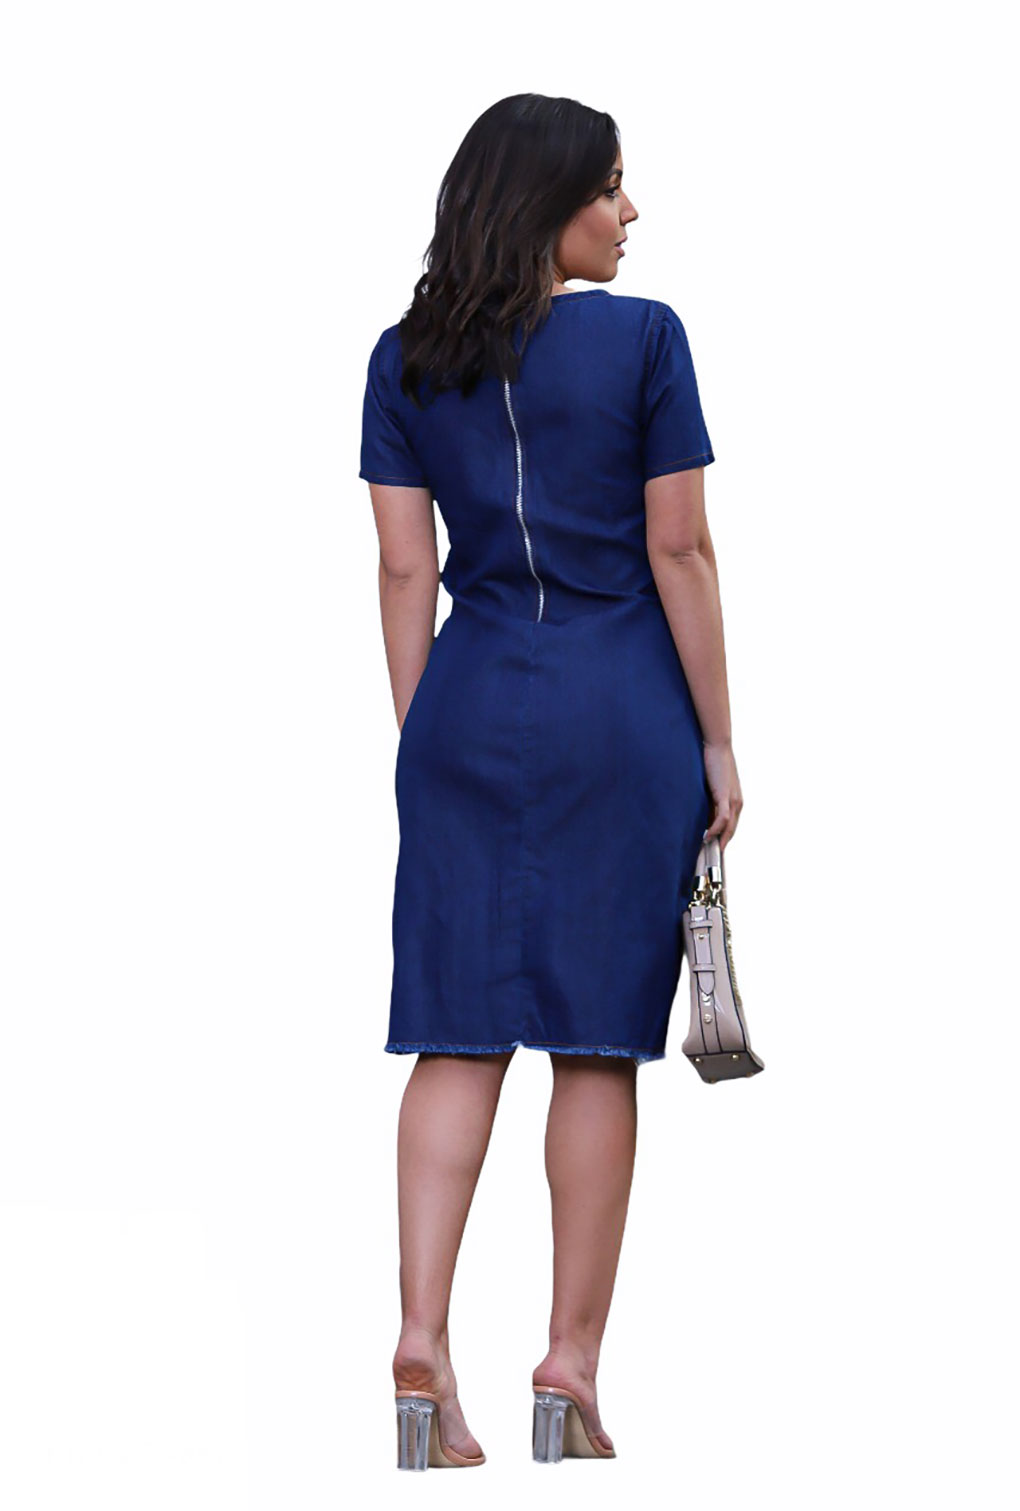 Vestido Jeans Amaciado Barra Desfiada Feminino  - ModaStore | Moda Feminina